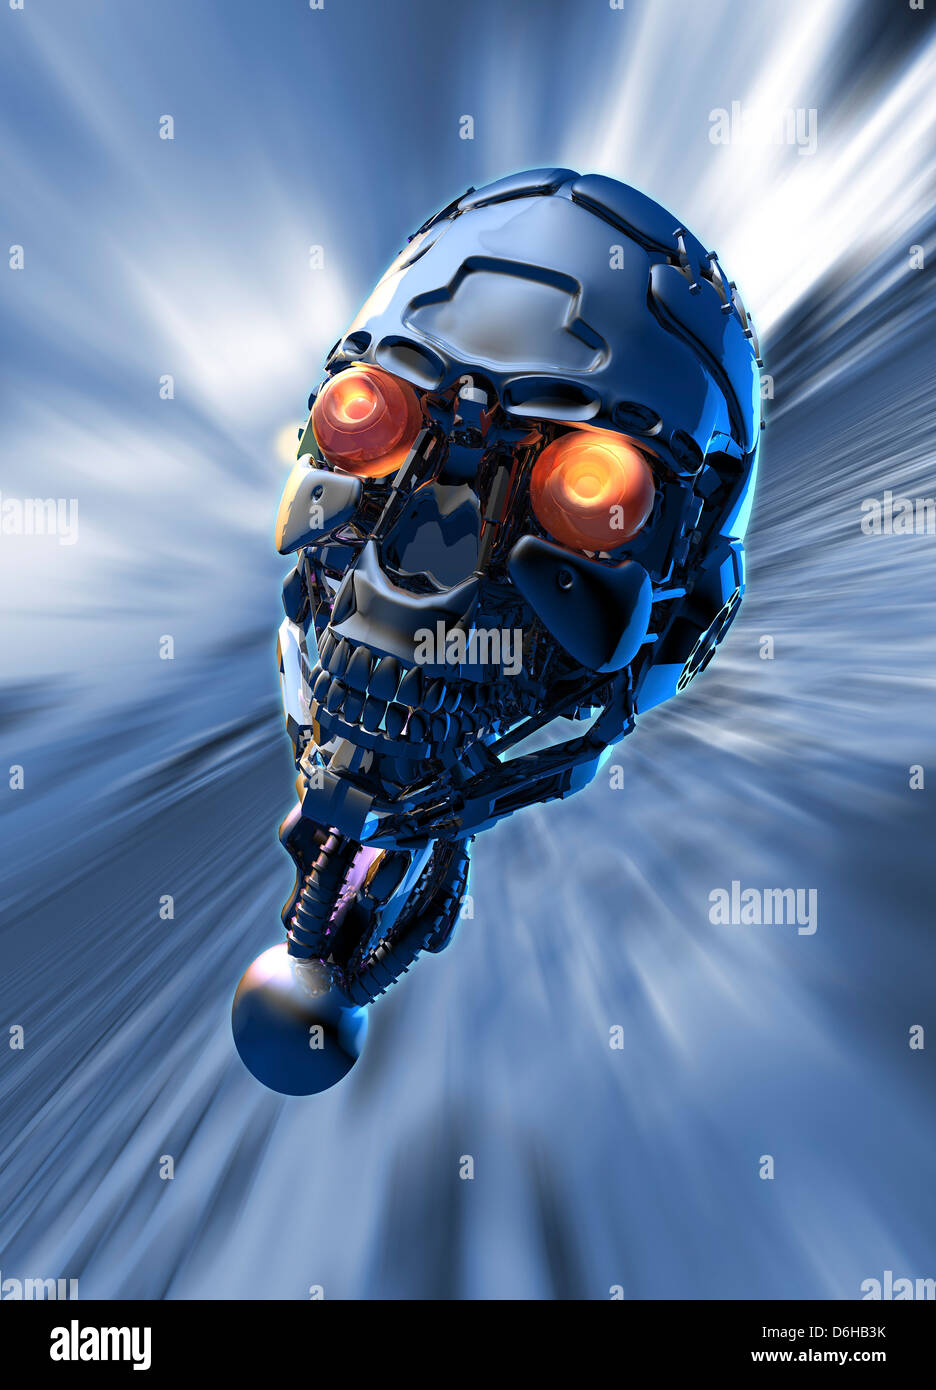 Cyborg, artwork - Stock Image